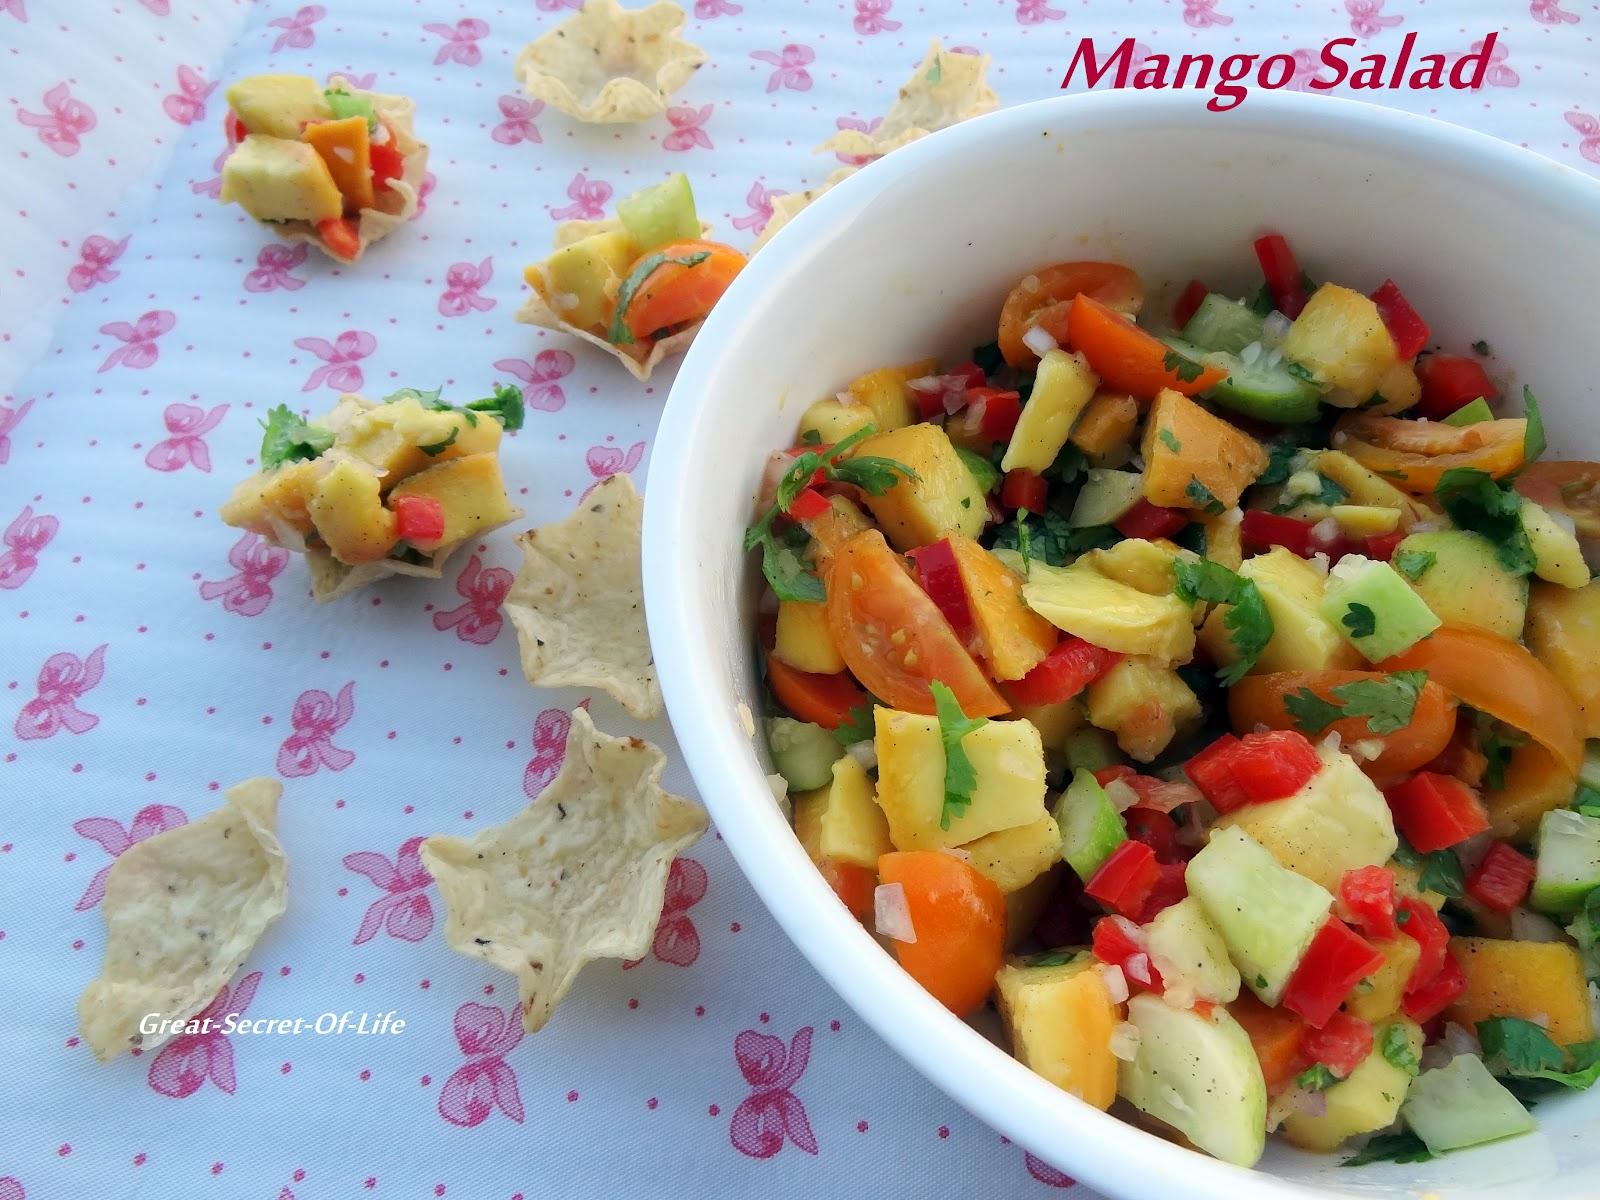 Mango Salad| Great-secret-of-life